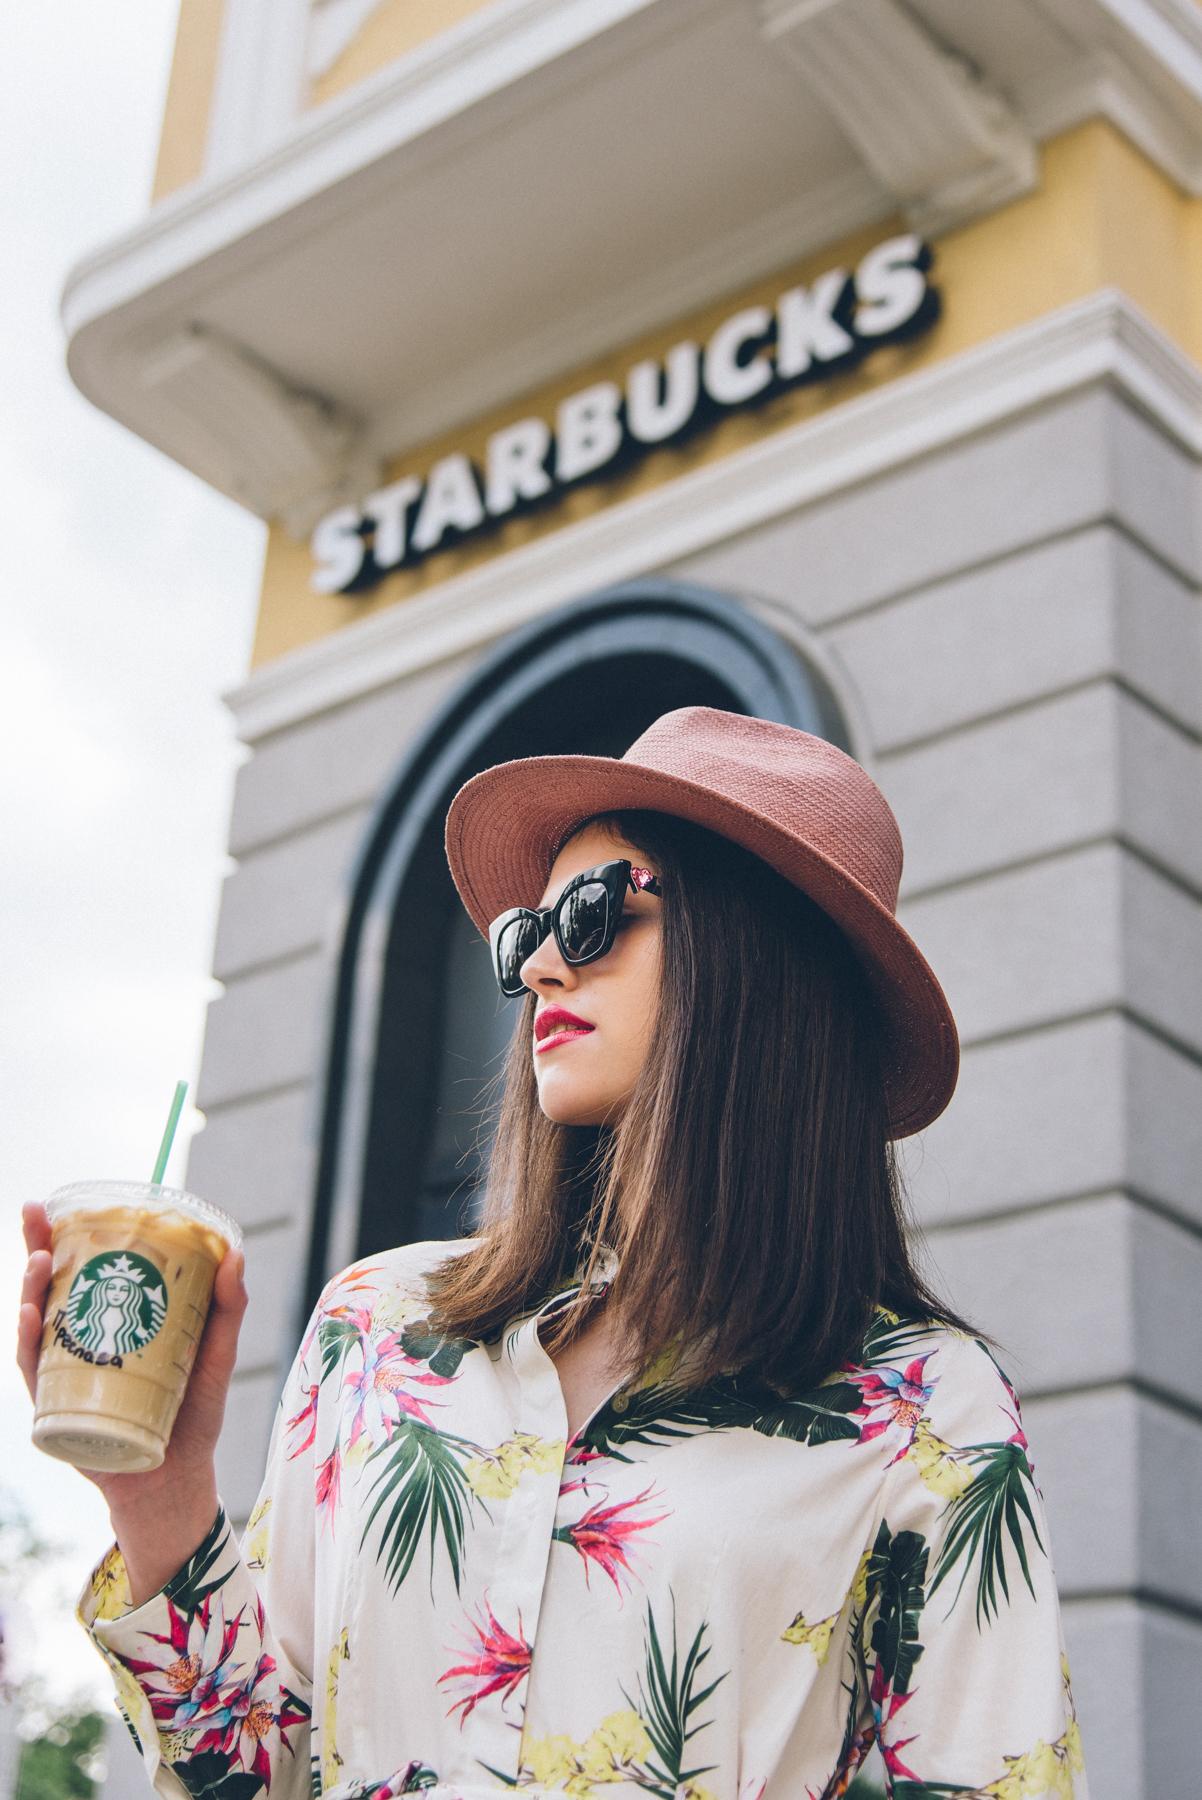 FASHION LOCATION: Starbucks